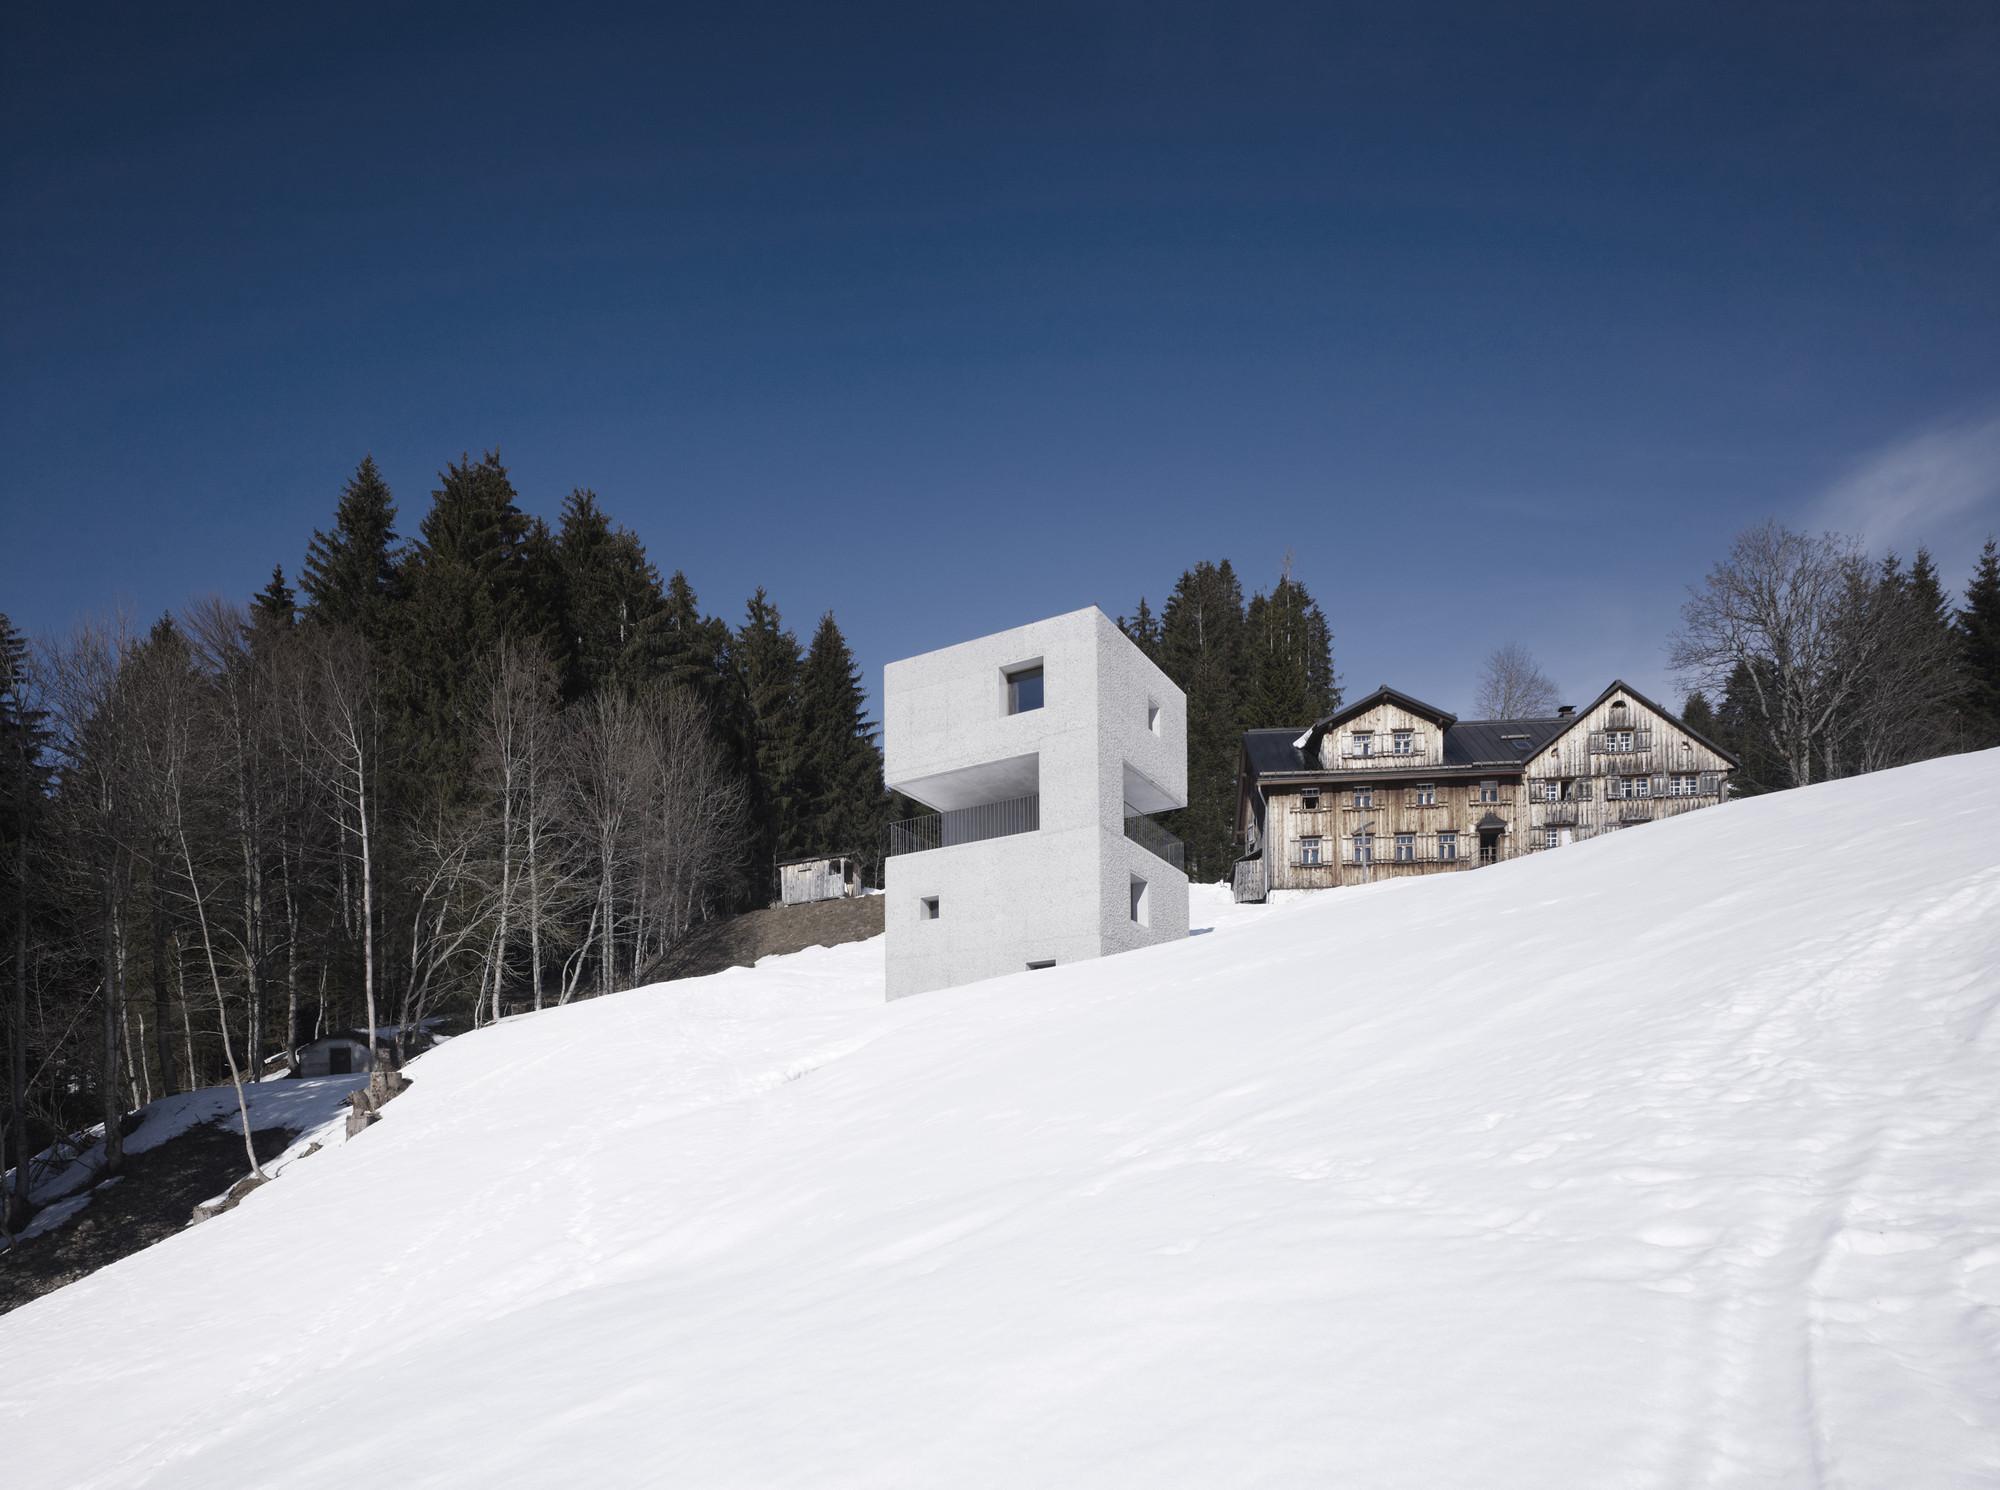 gallery of mountain cabin marte marte architekten 9. Black Bedroom Furniture Sets. Home Design Ideas